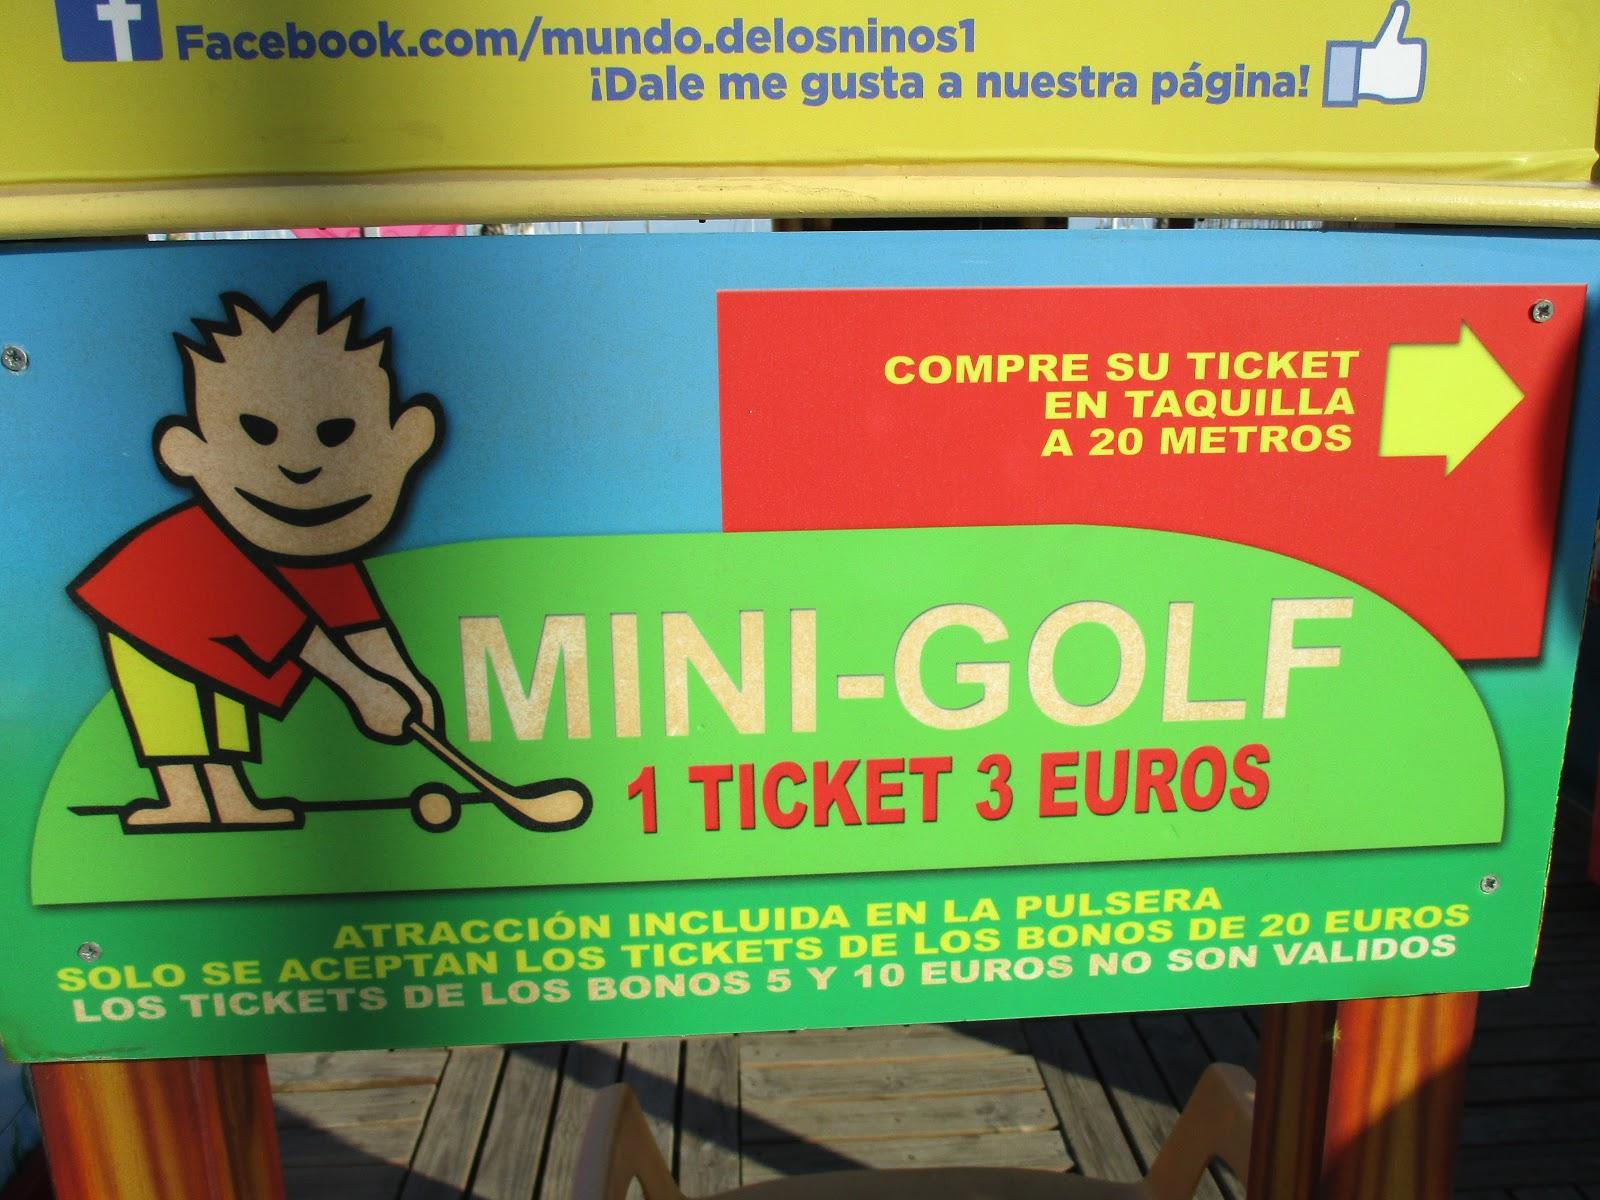 Two Crazy Golfers: Crazy golf in Alicante, Costa Blanca, Spain on tractor supply windmill, crazy golf windmill, illustration mini golf windmill, putt-putt golf windmill, miniature windmill already assembled, bangkok golf windmill,